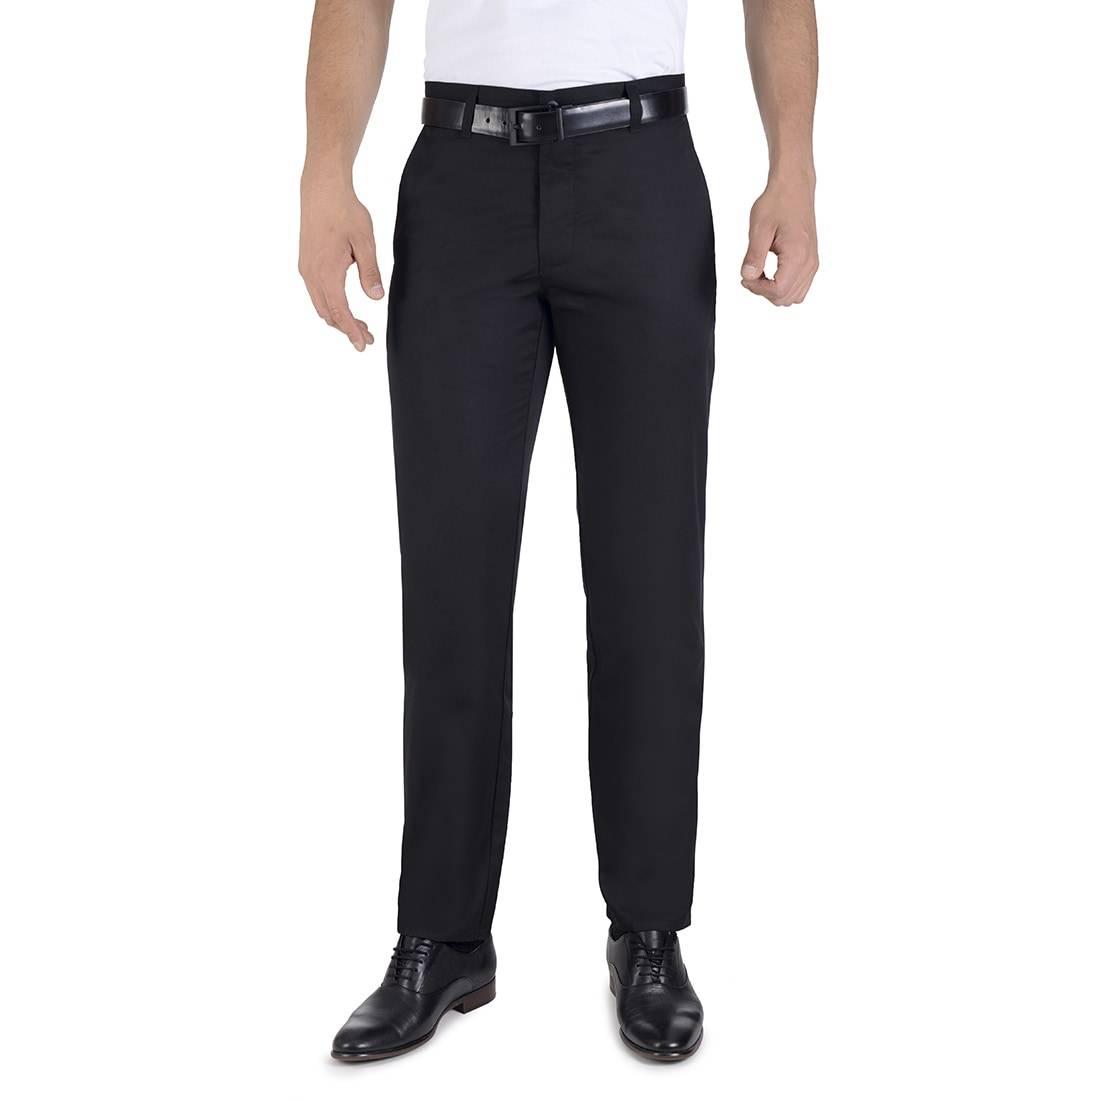 010920418909-01-Pantalon-Casual-Slim-Fit-Negro-yale